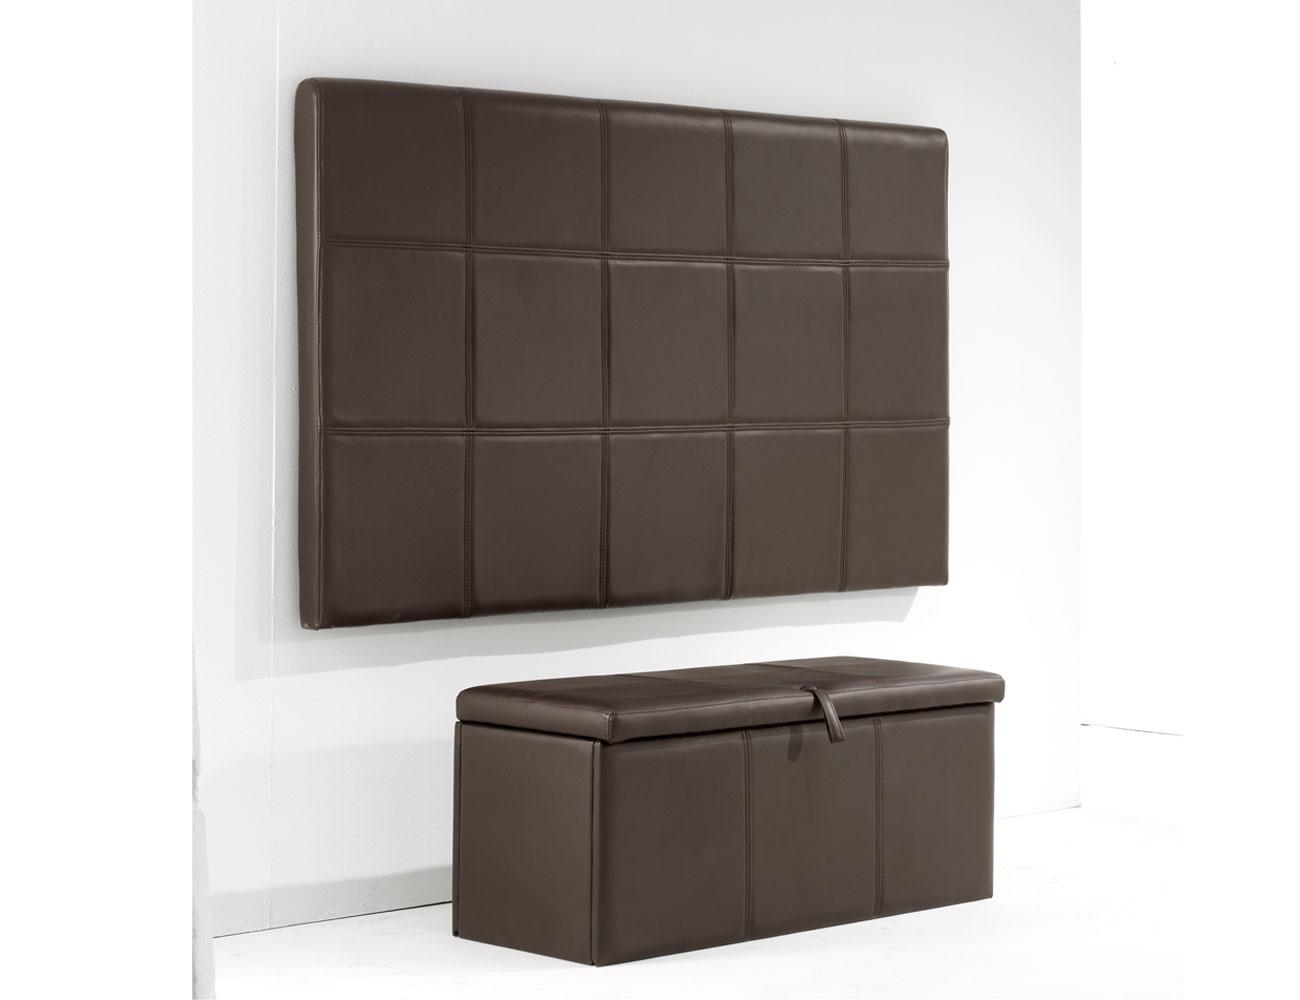 Cabecero tapizado polipiel cuadros chocolate 2